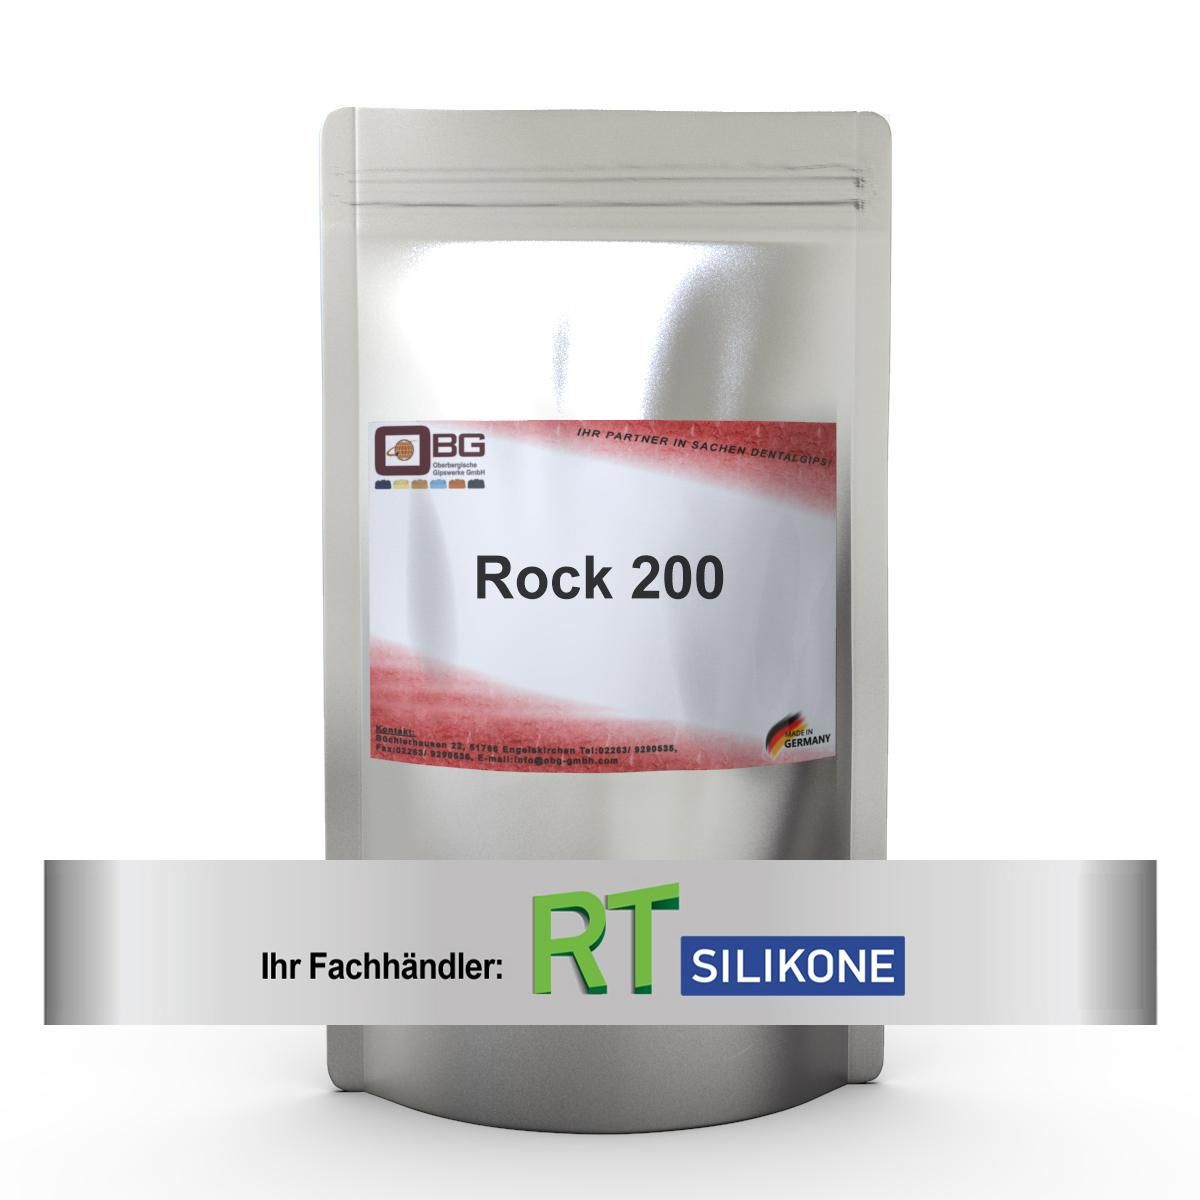 Rock 200 Zahnkranzgips grau 5:1